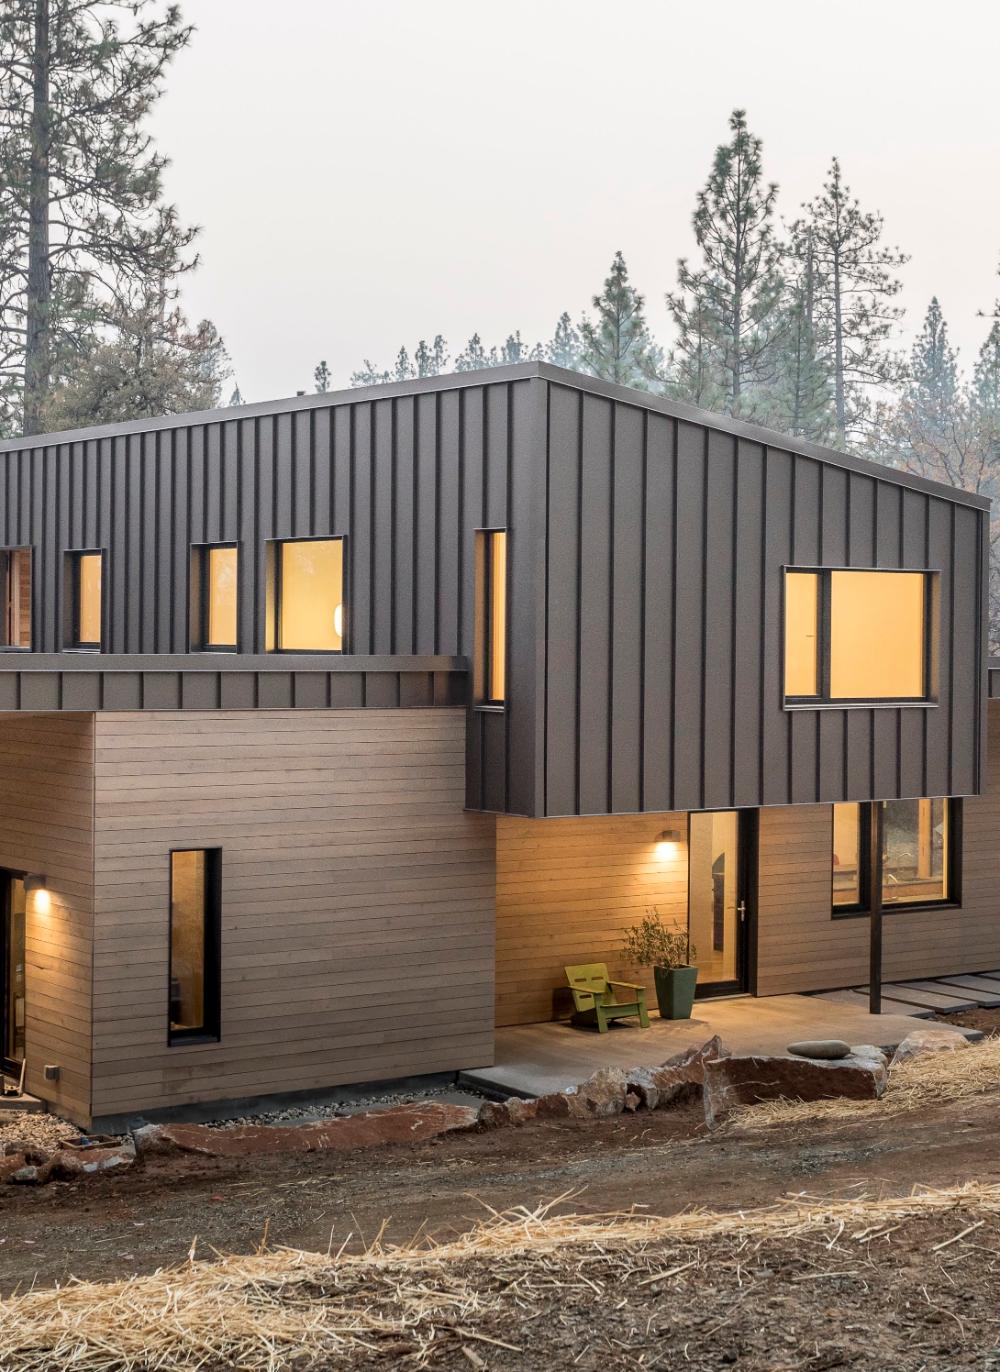 Bridger Steel Bonderized Metal Roofing And Siding Panel Metal Siding House House Cladding Corrugated Metal Siding